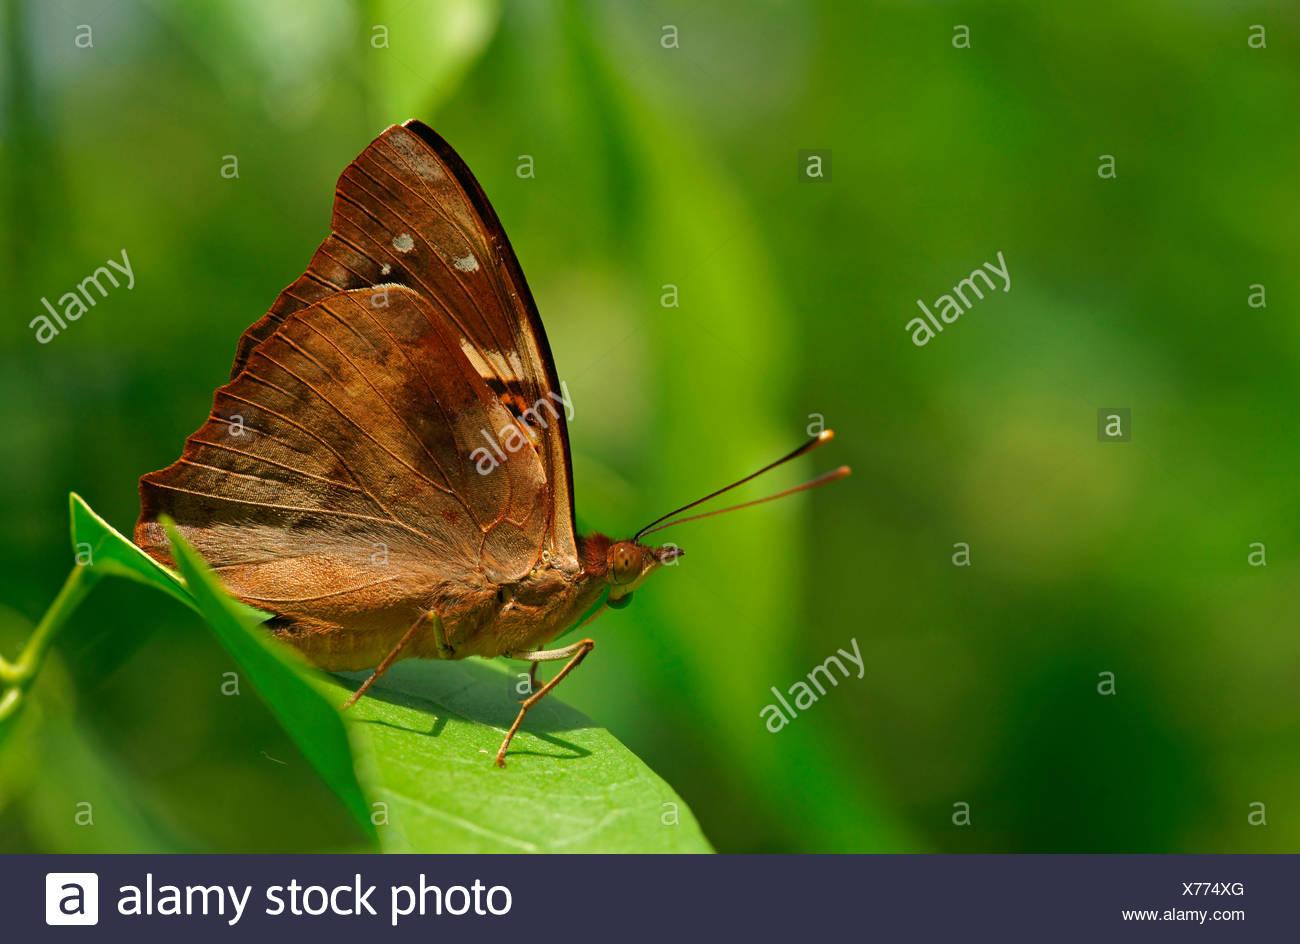 Nymphalidae (Nymphidae) farfalle tropicali, (Doxocopa linda), Iguazú National Park, Paraná, Brasile Immagini Stock